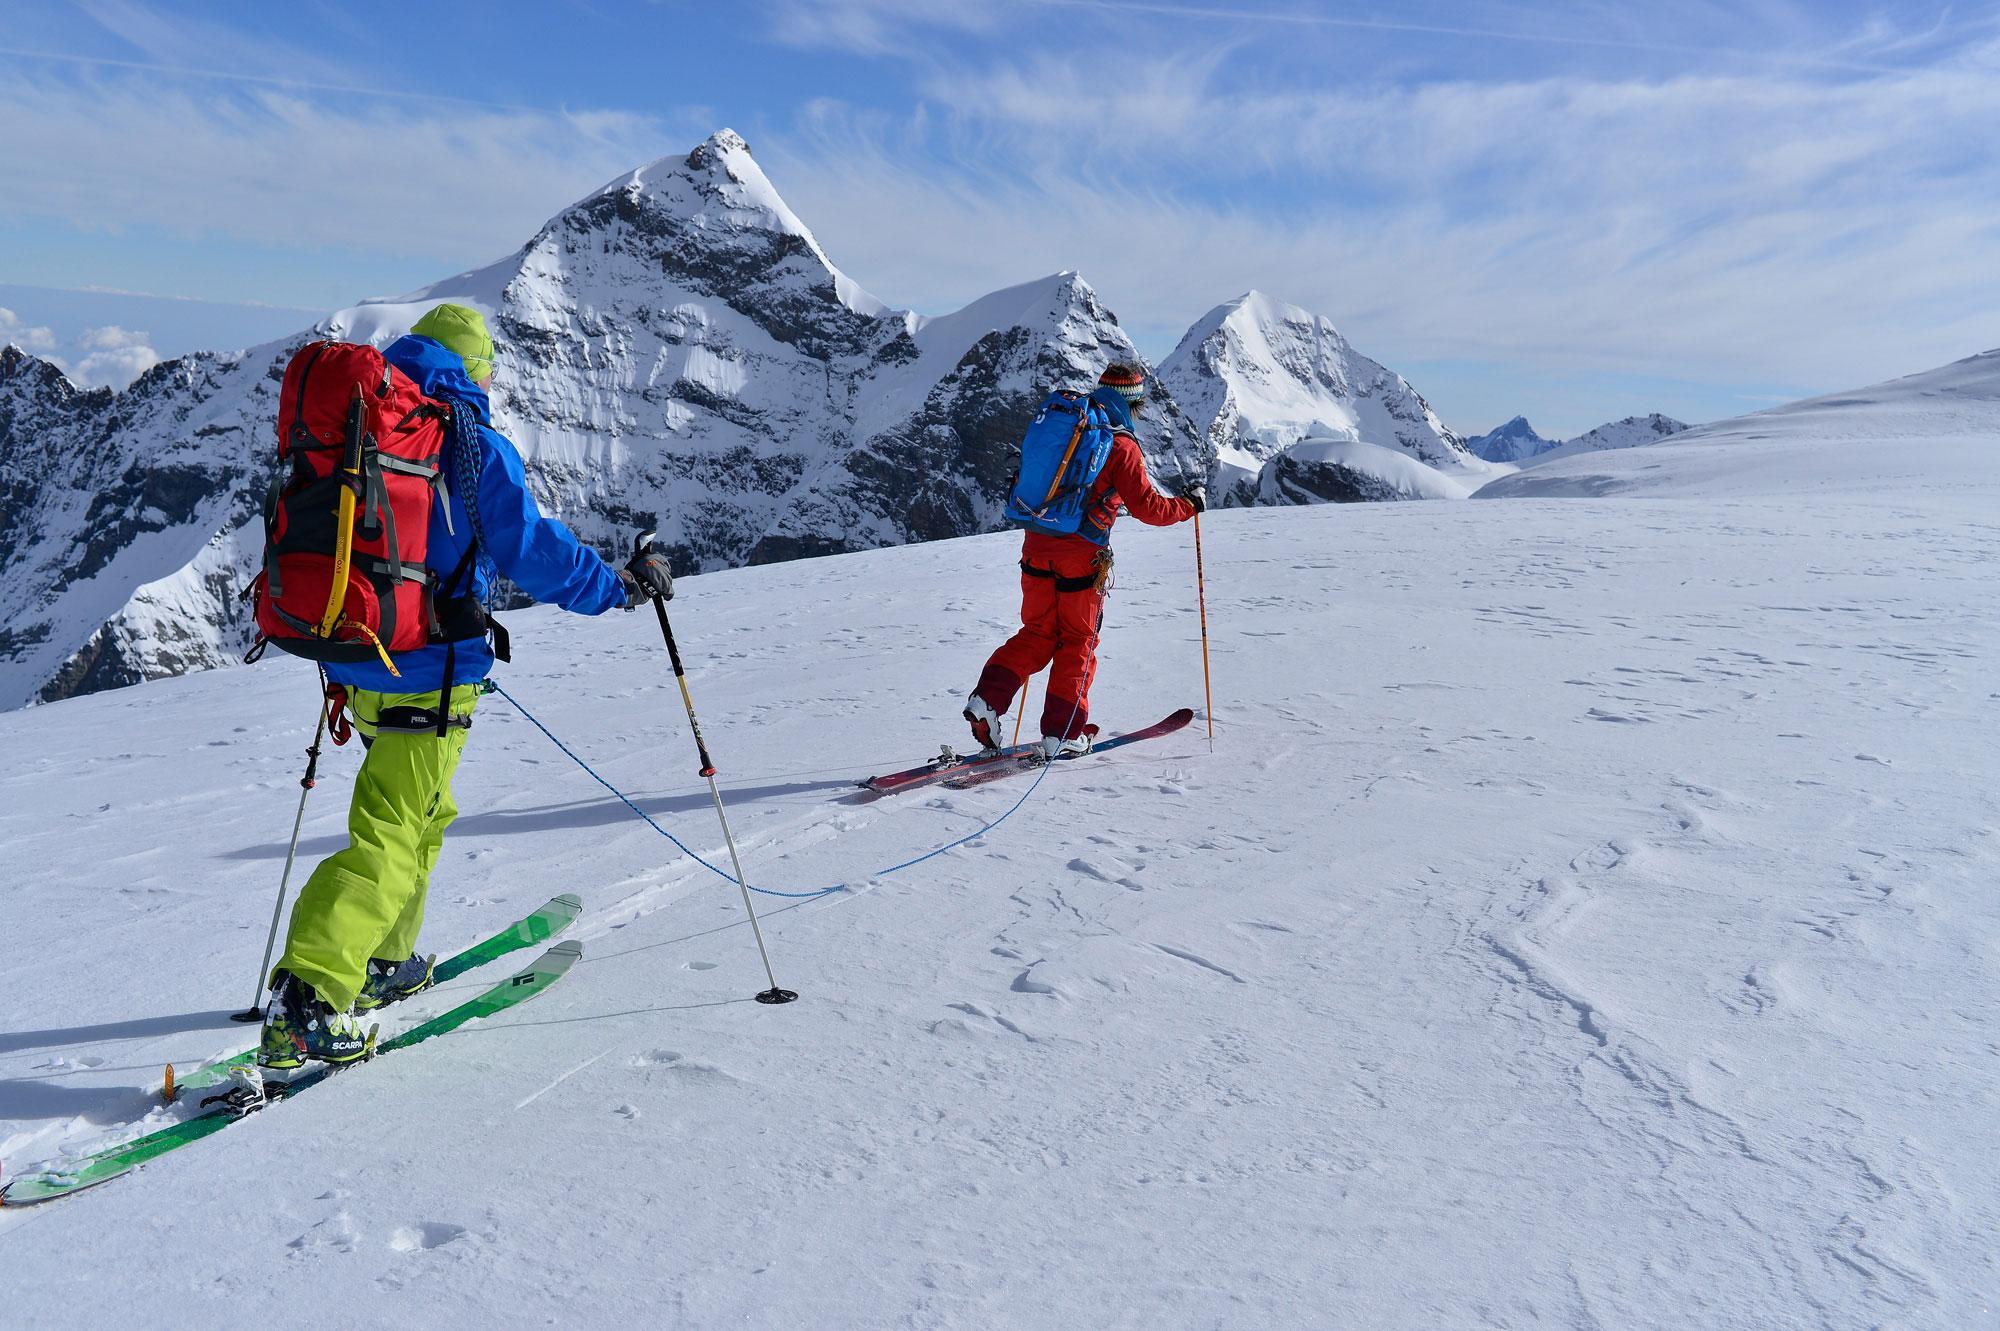 Skitourenaufstieg